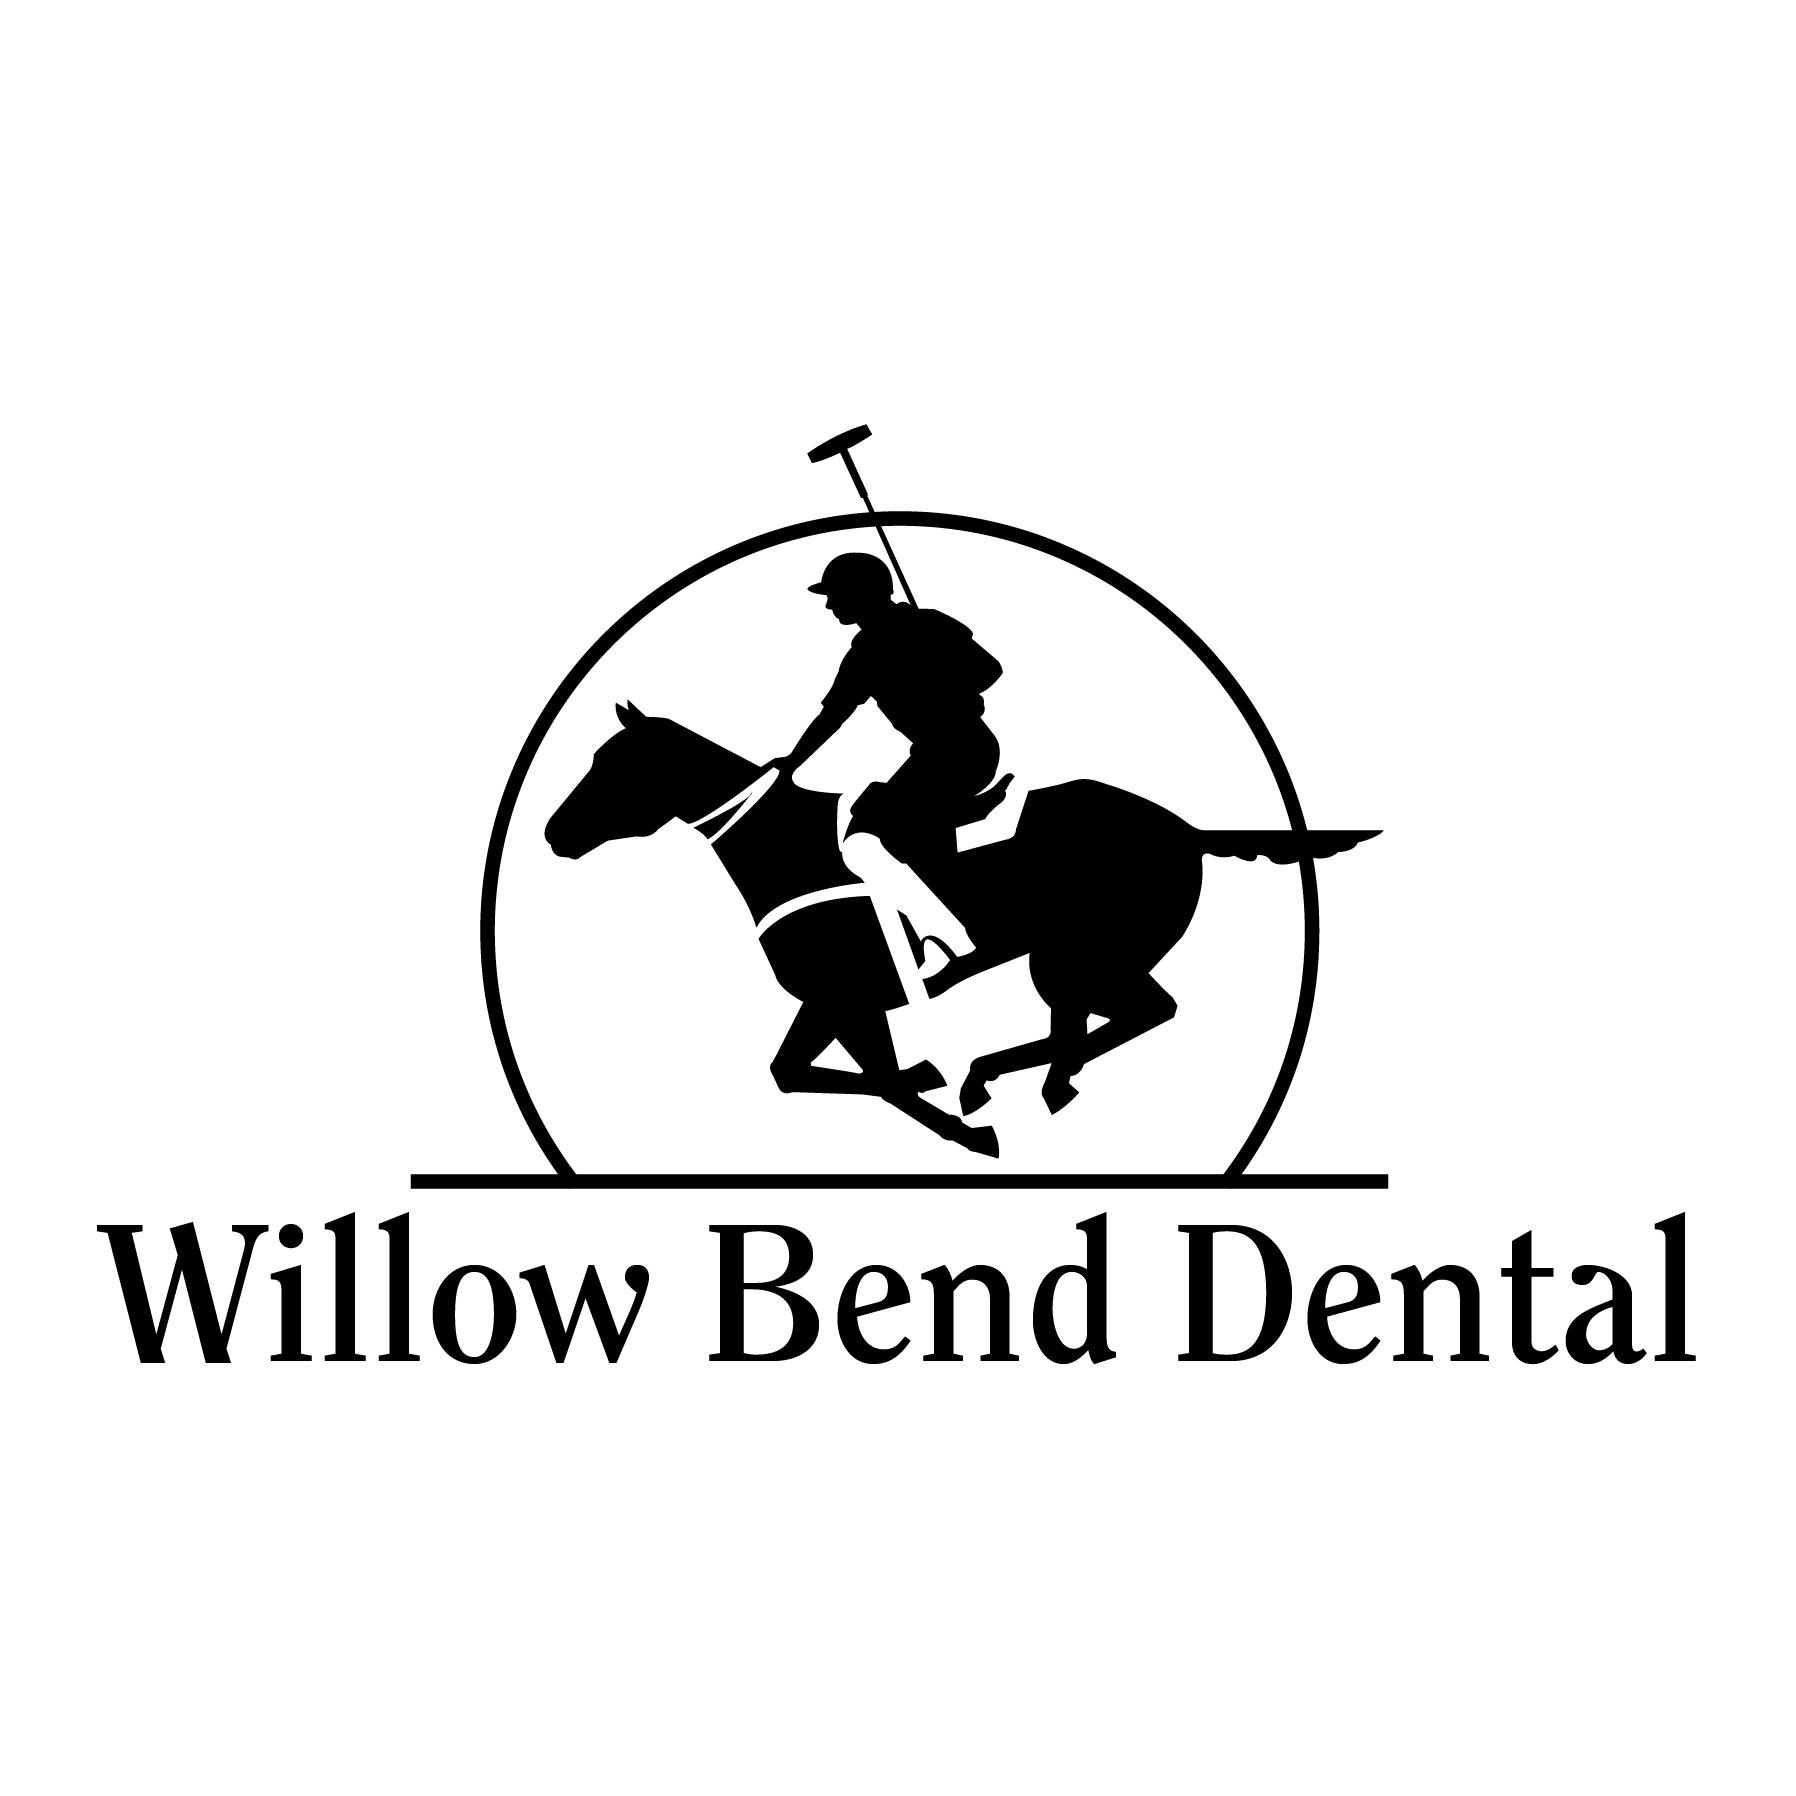 Willow Bend Dental